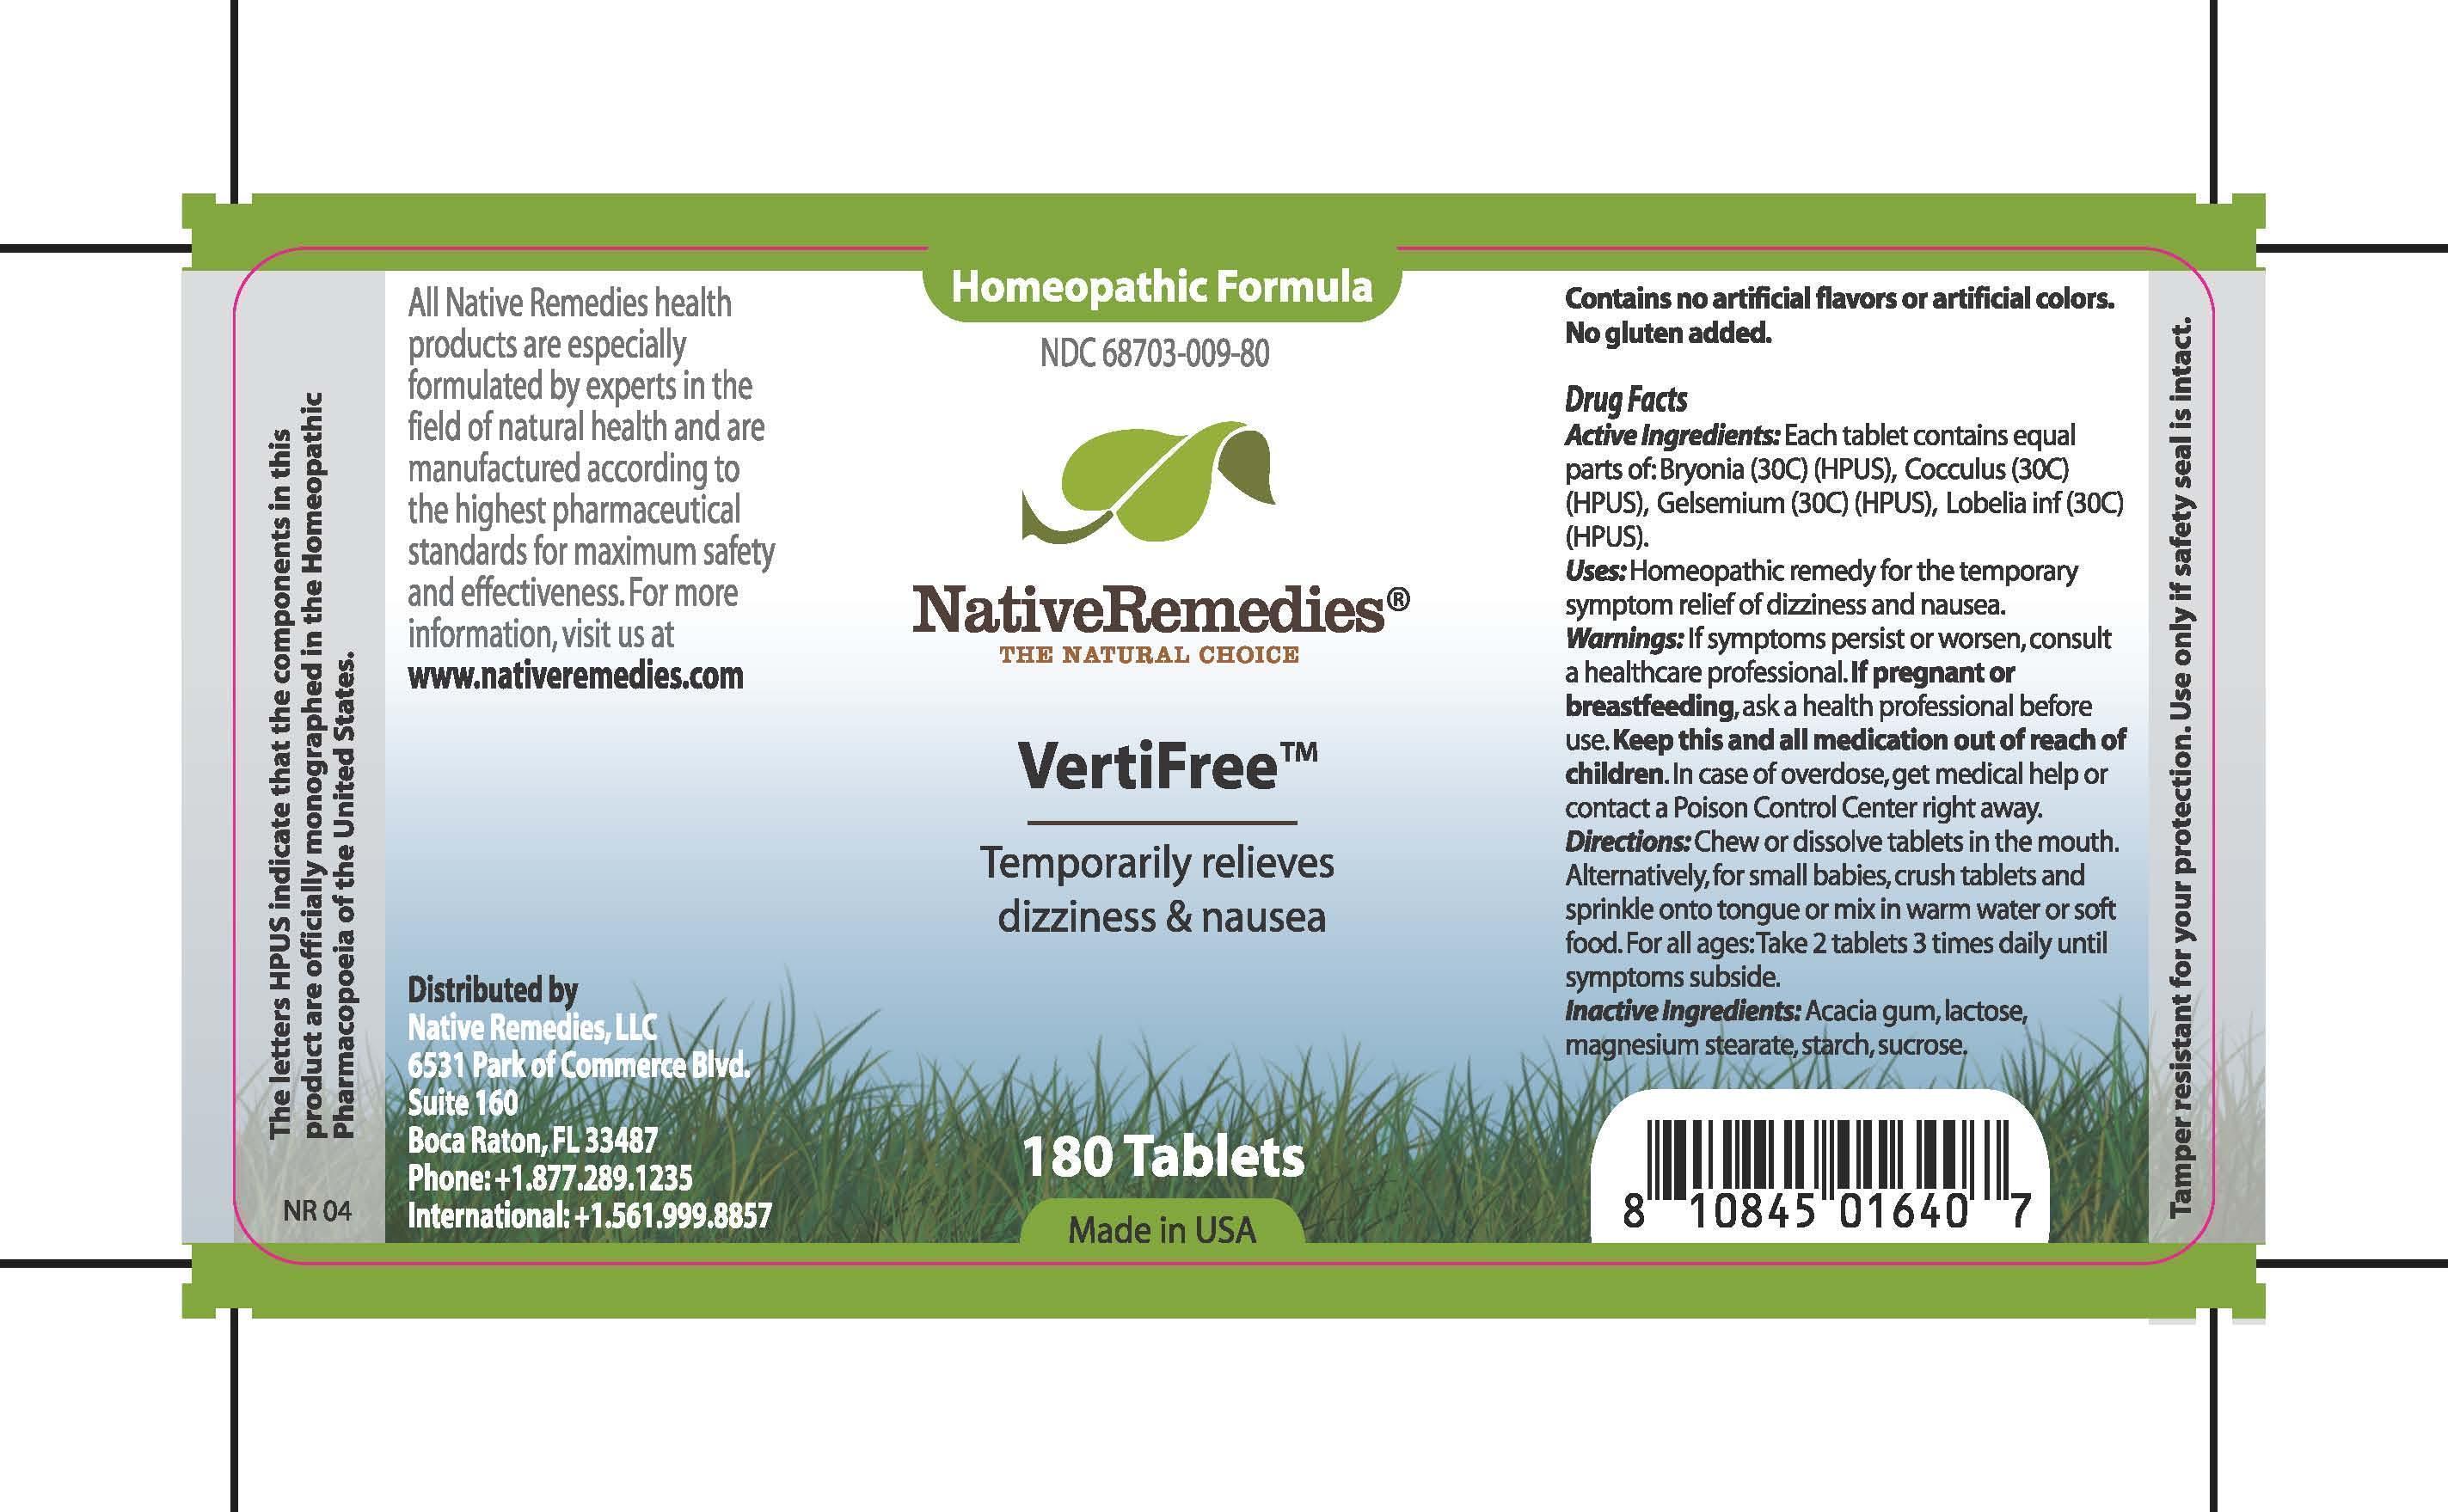 Vertifree (Bryonia , Cocculus, Gelsemium, Lobelia Inf, Acacia Gum, Lactose, Magnesium Stearate, Corn Starch, Sucrose) Tablet [Native Remedies Llc]